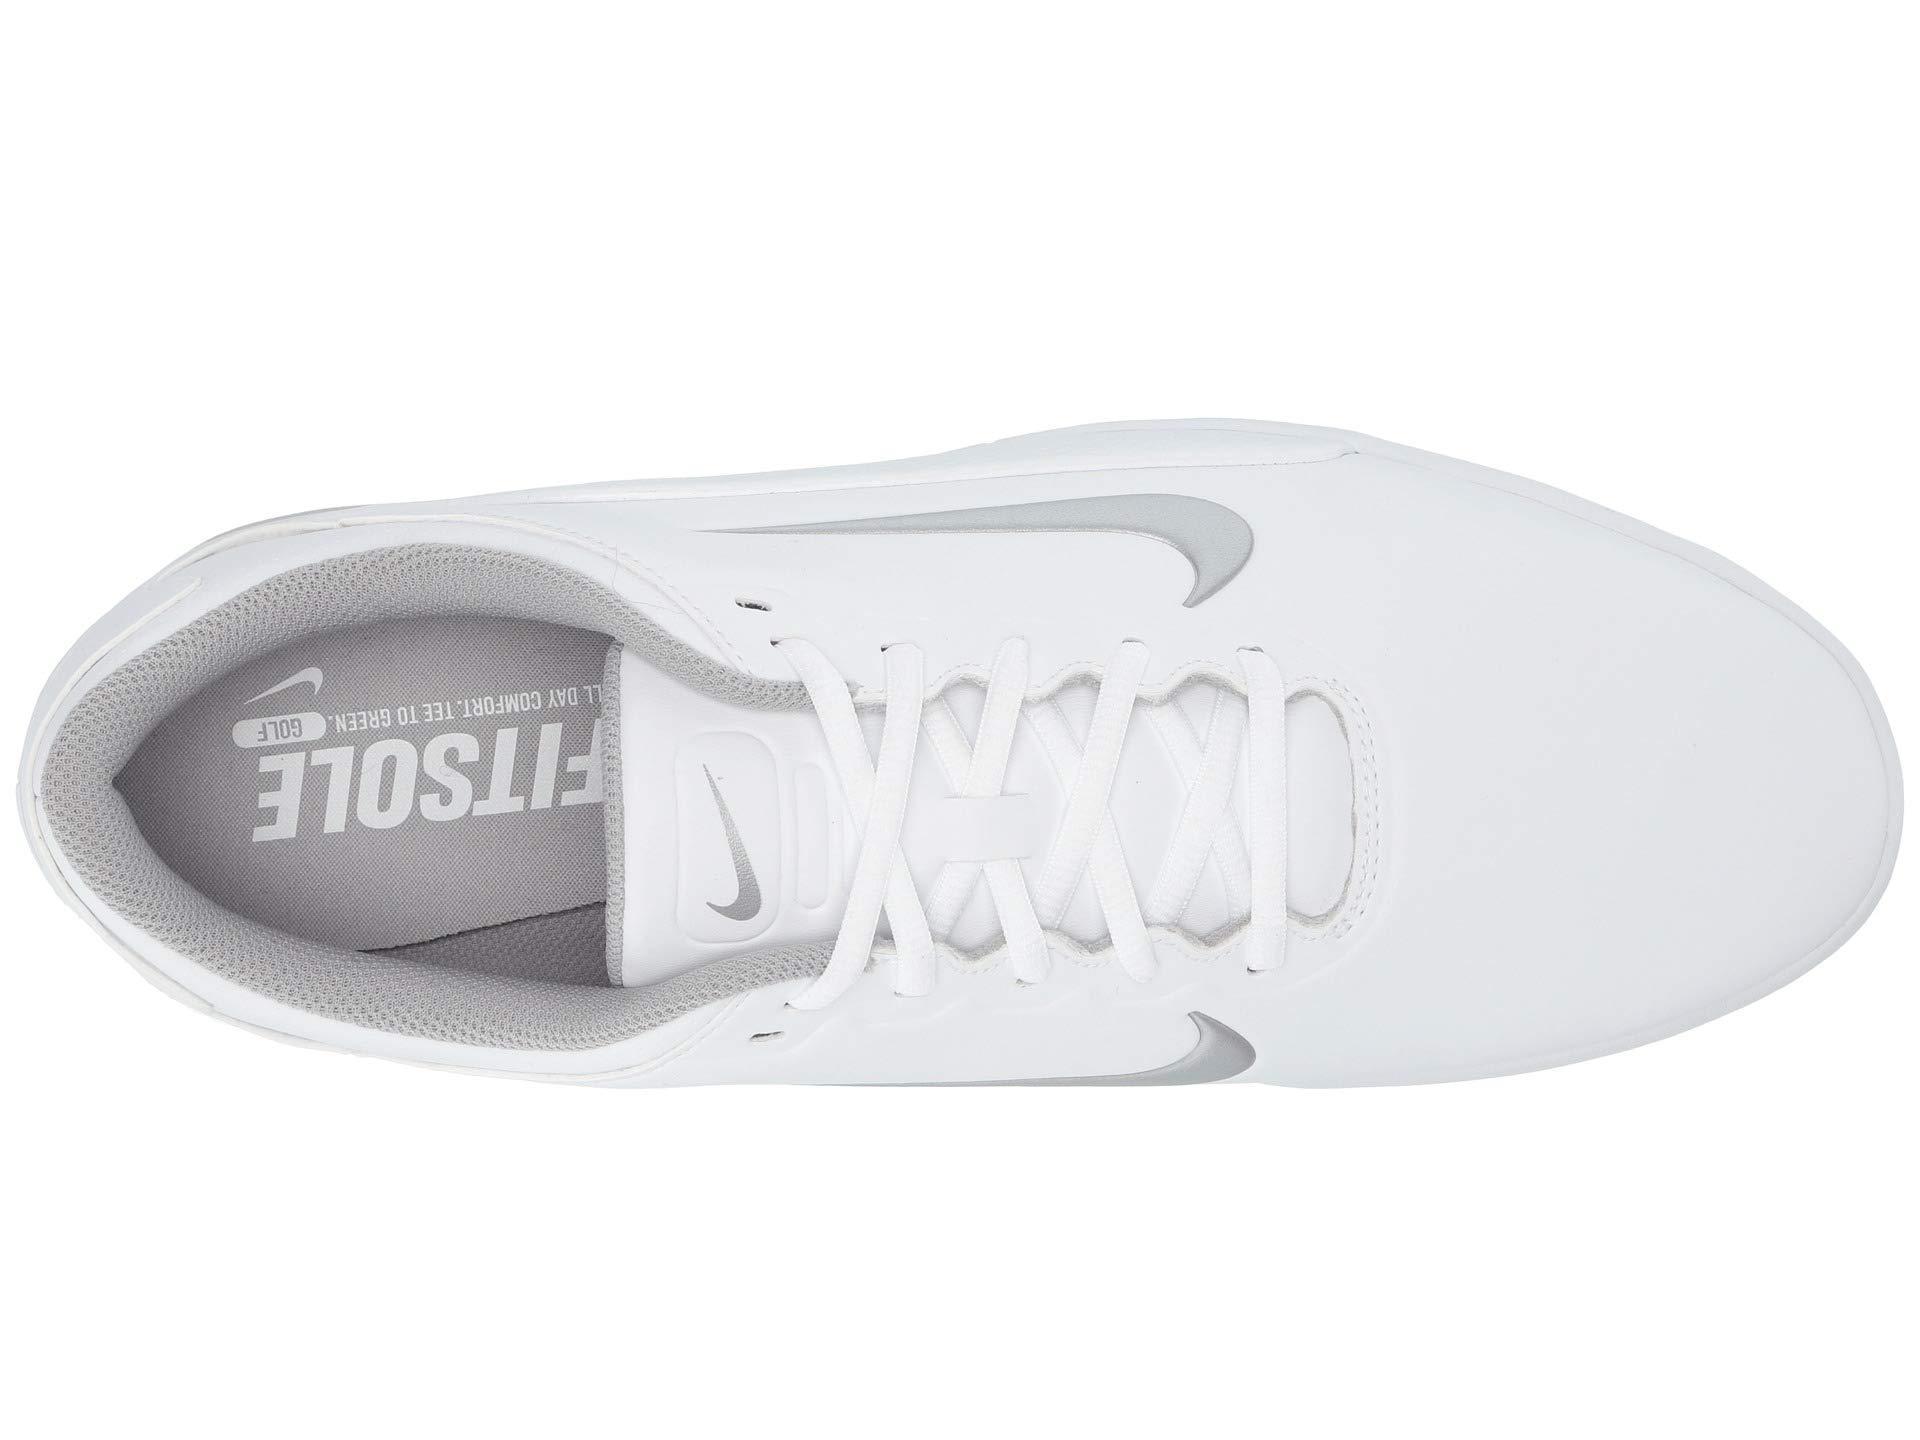 db11d3cbcbb Nike - Vapor (white metallic Silver pure Platinum) Men s Golf Shoes for.  View fullscreen